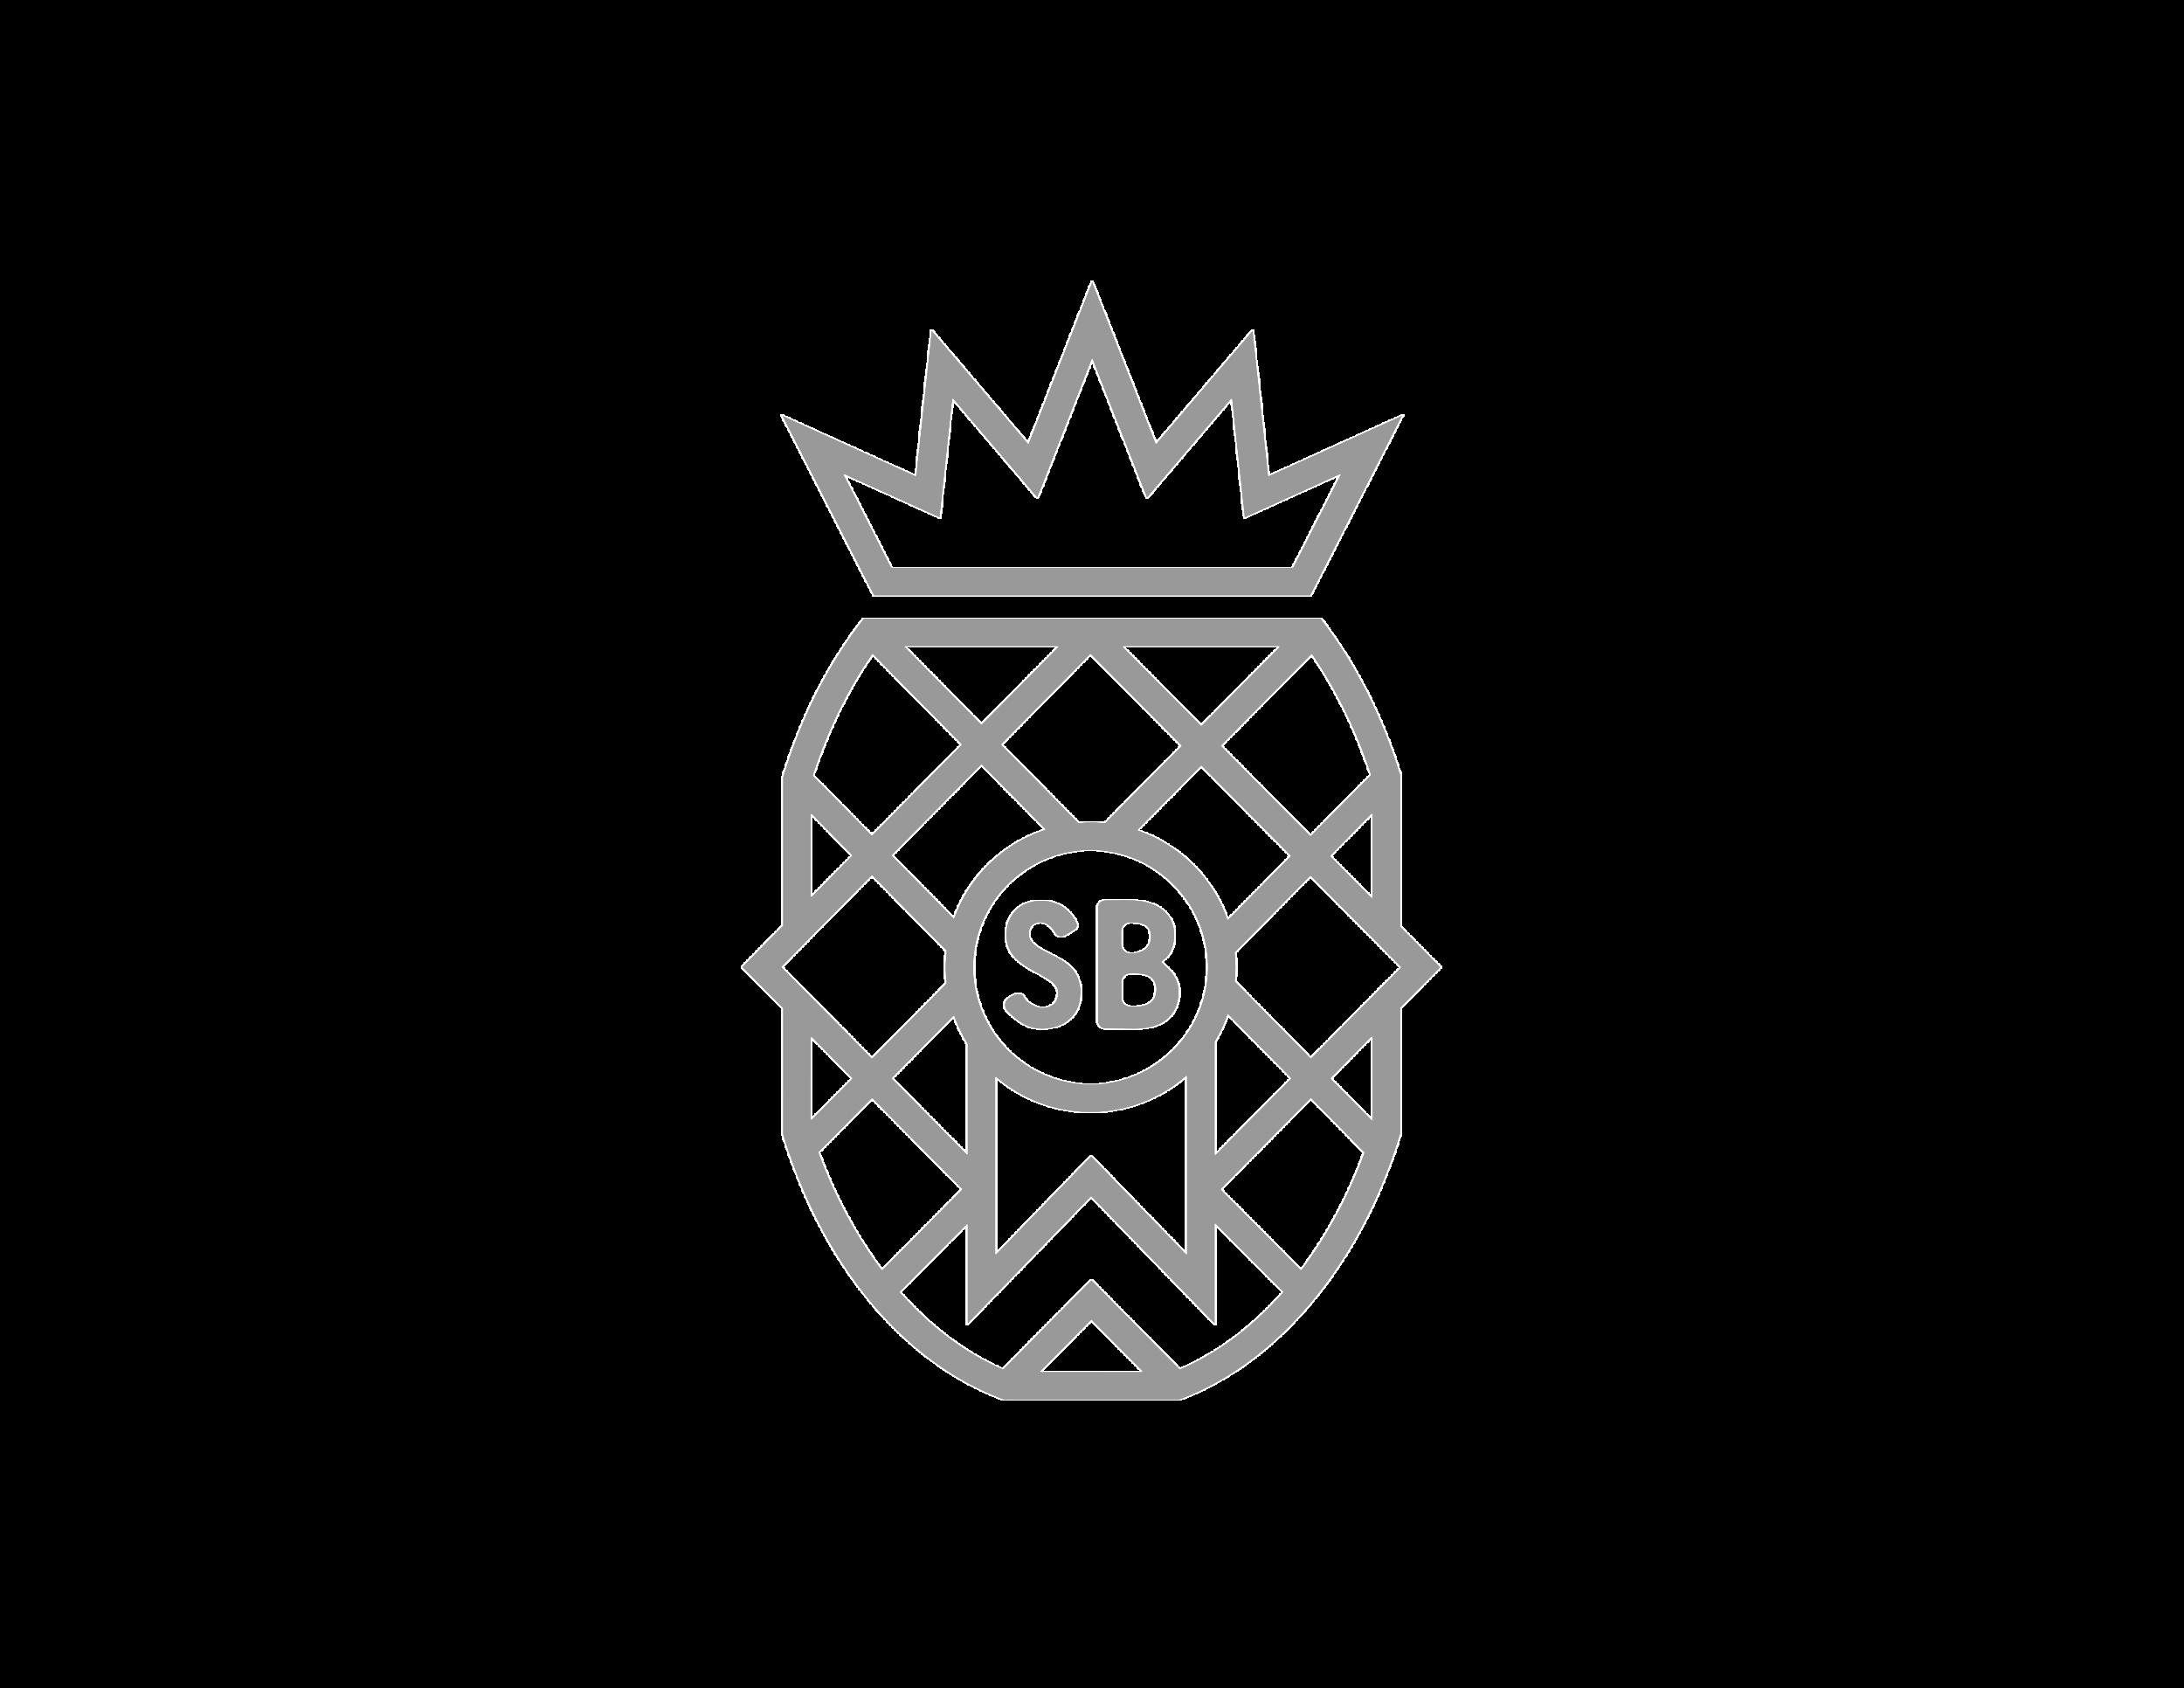 SB.png